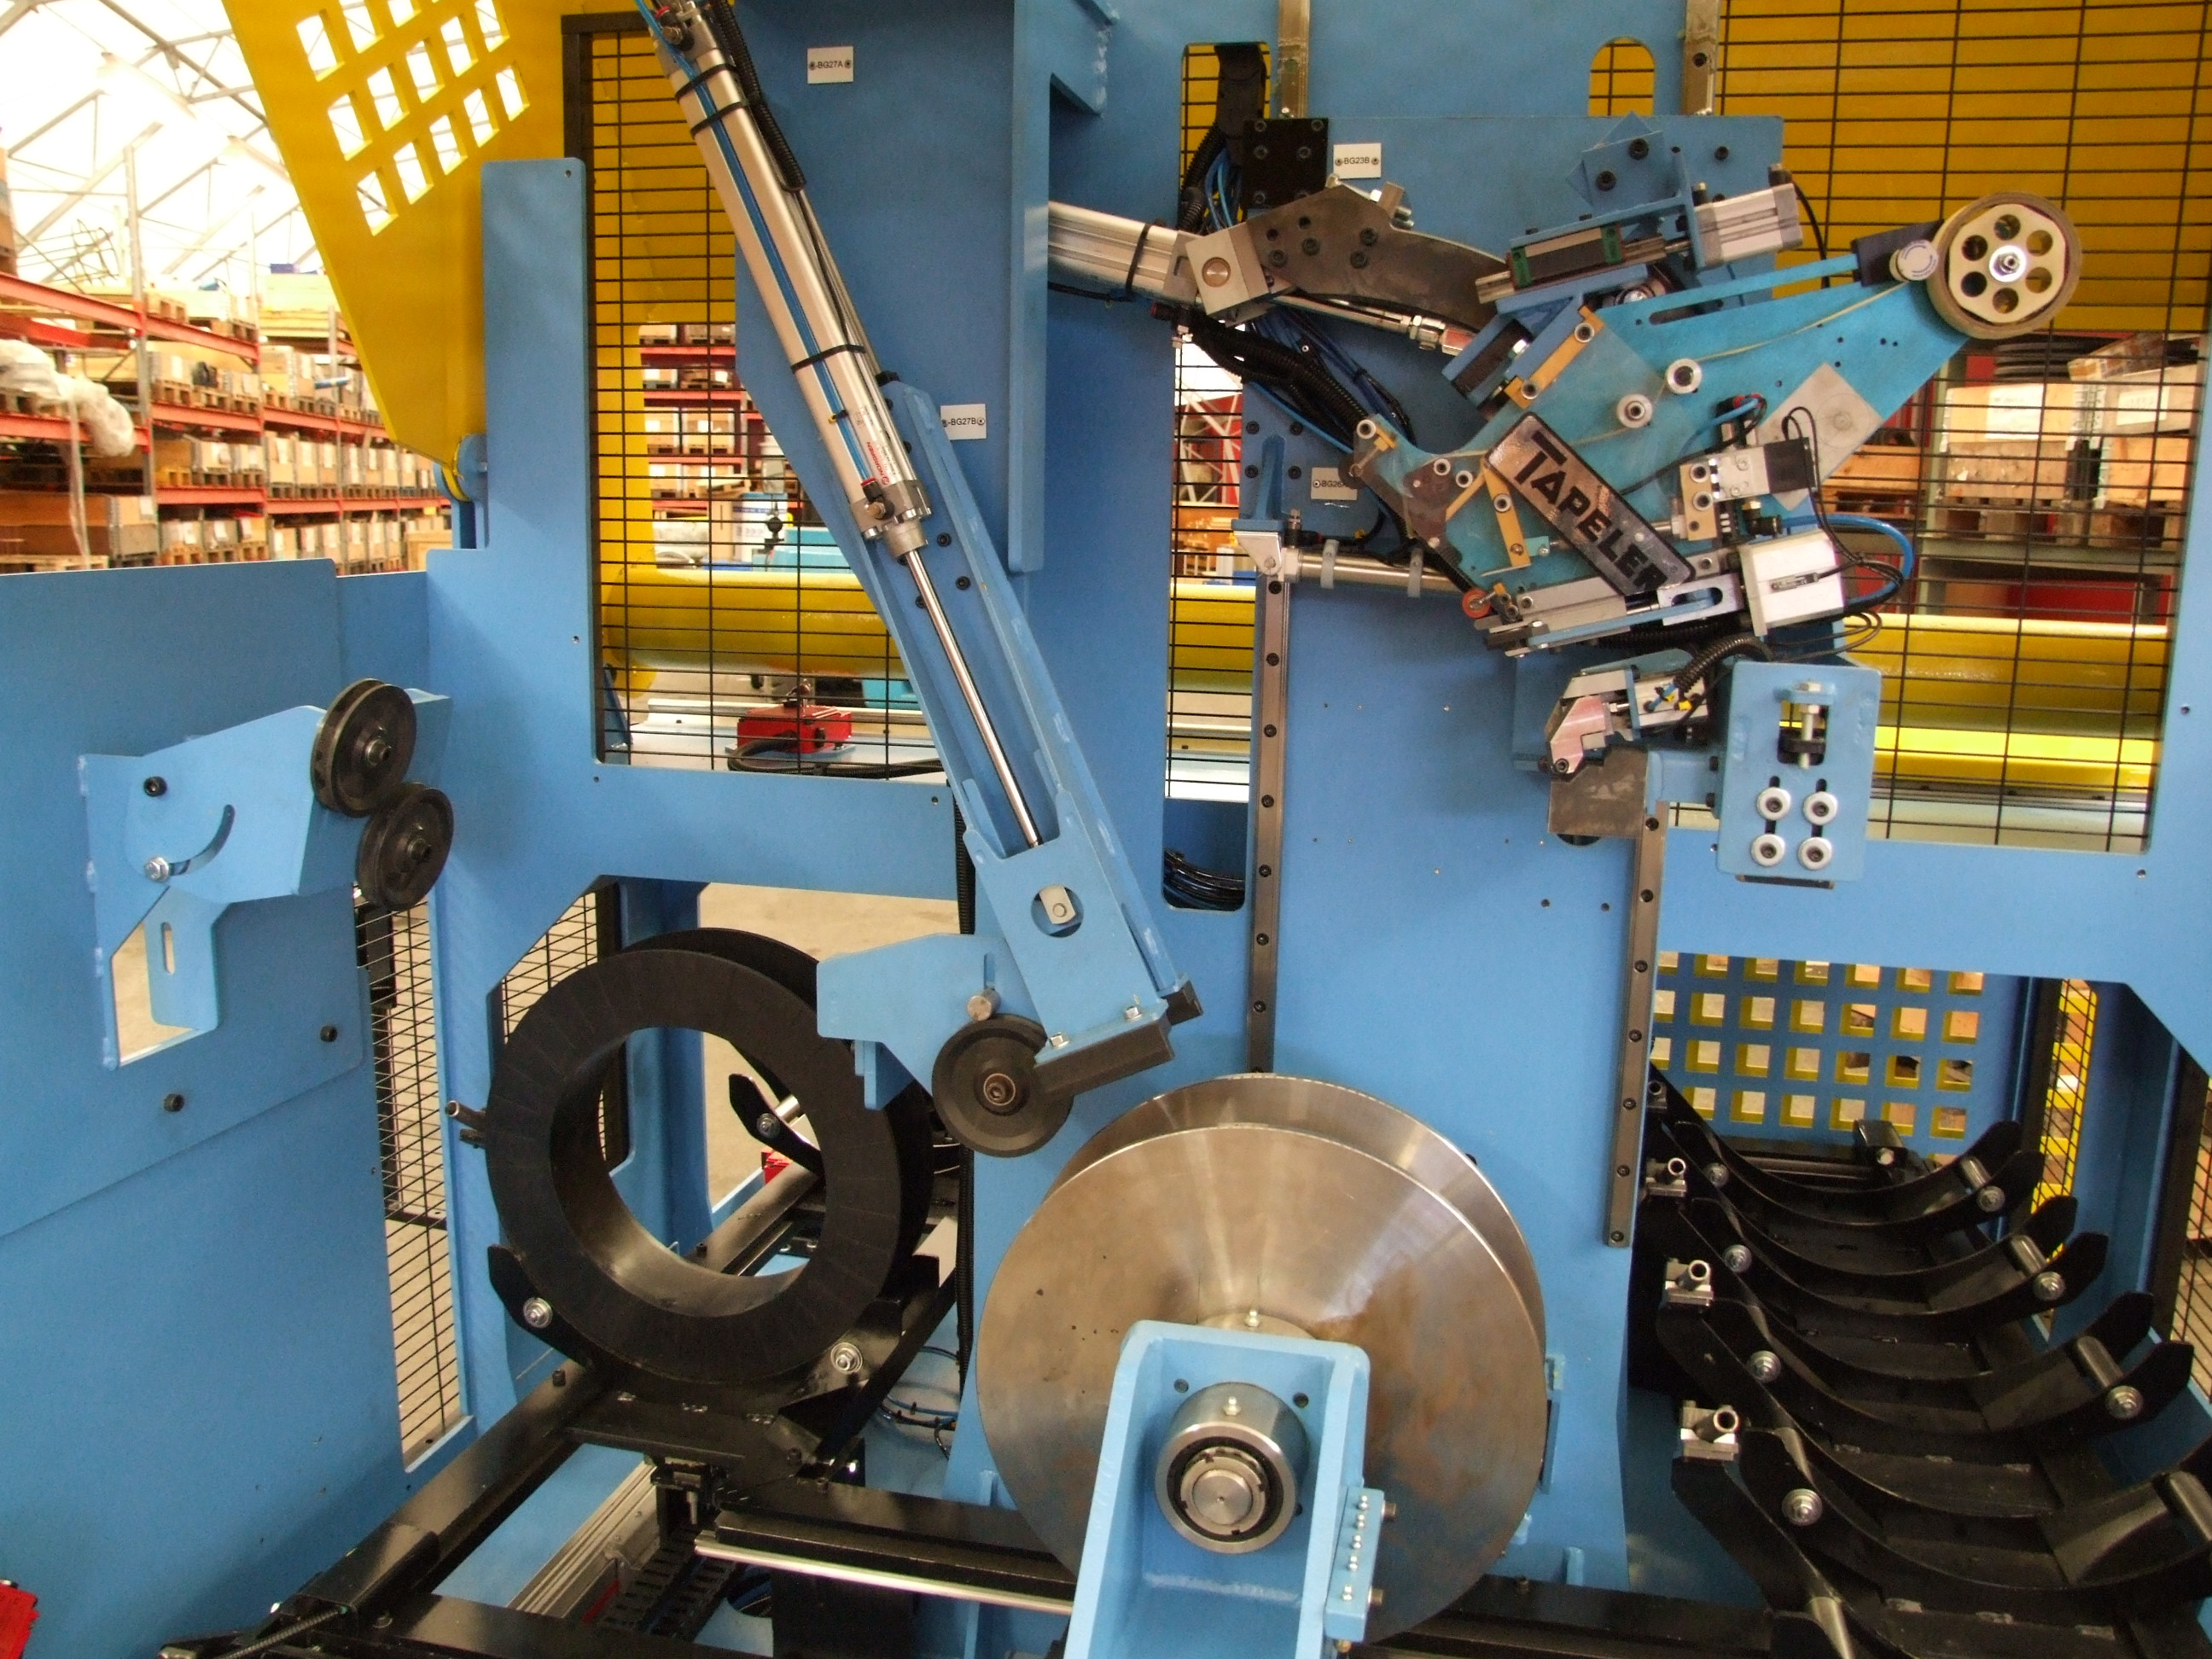 Automatic Spooling Machine (ASPM)